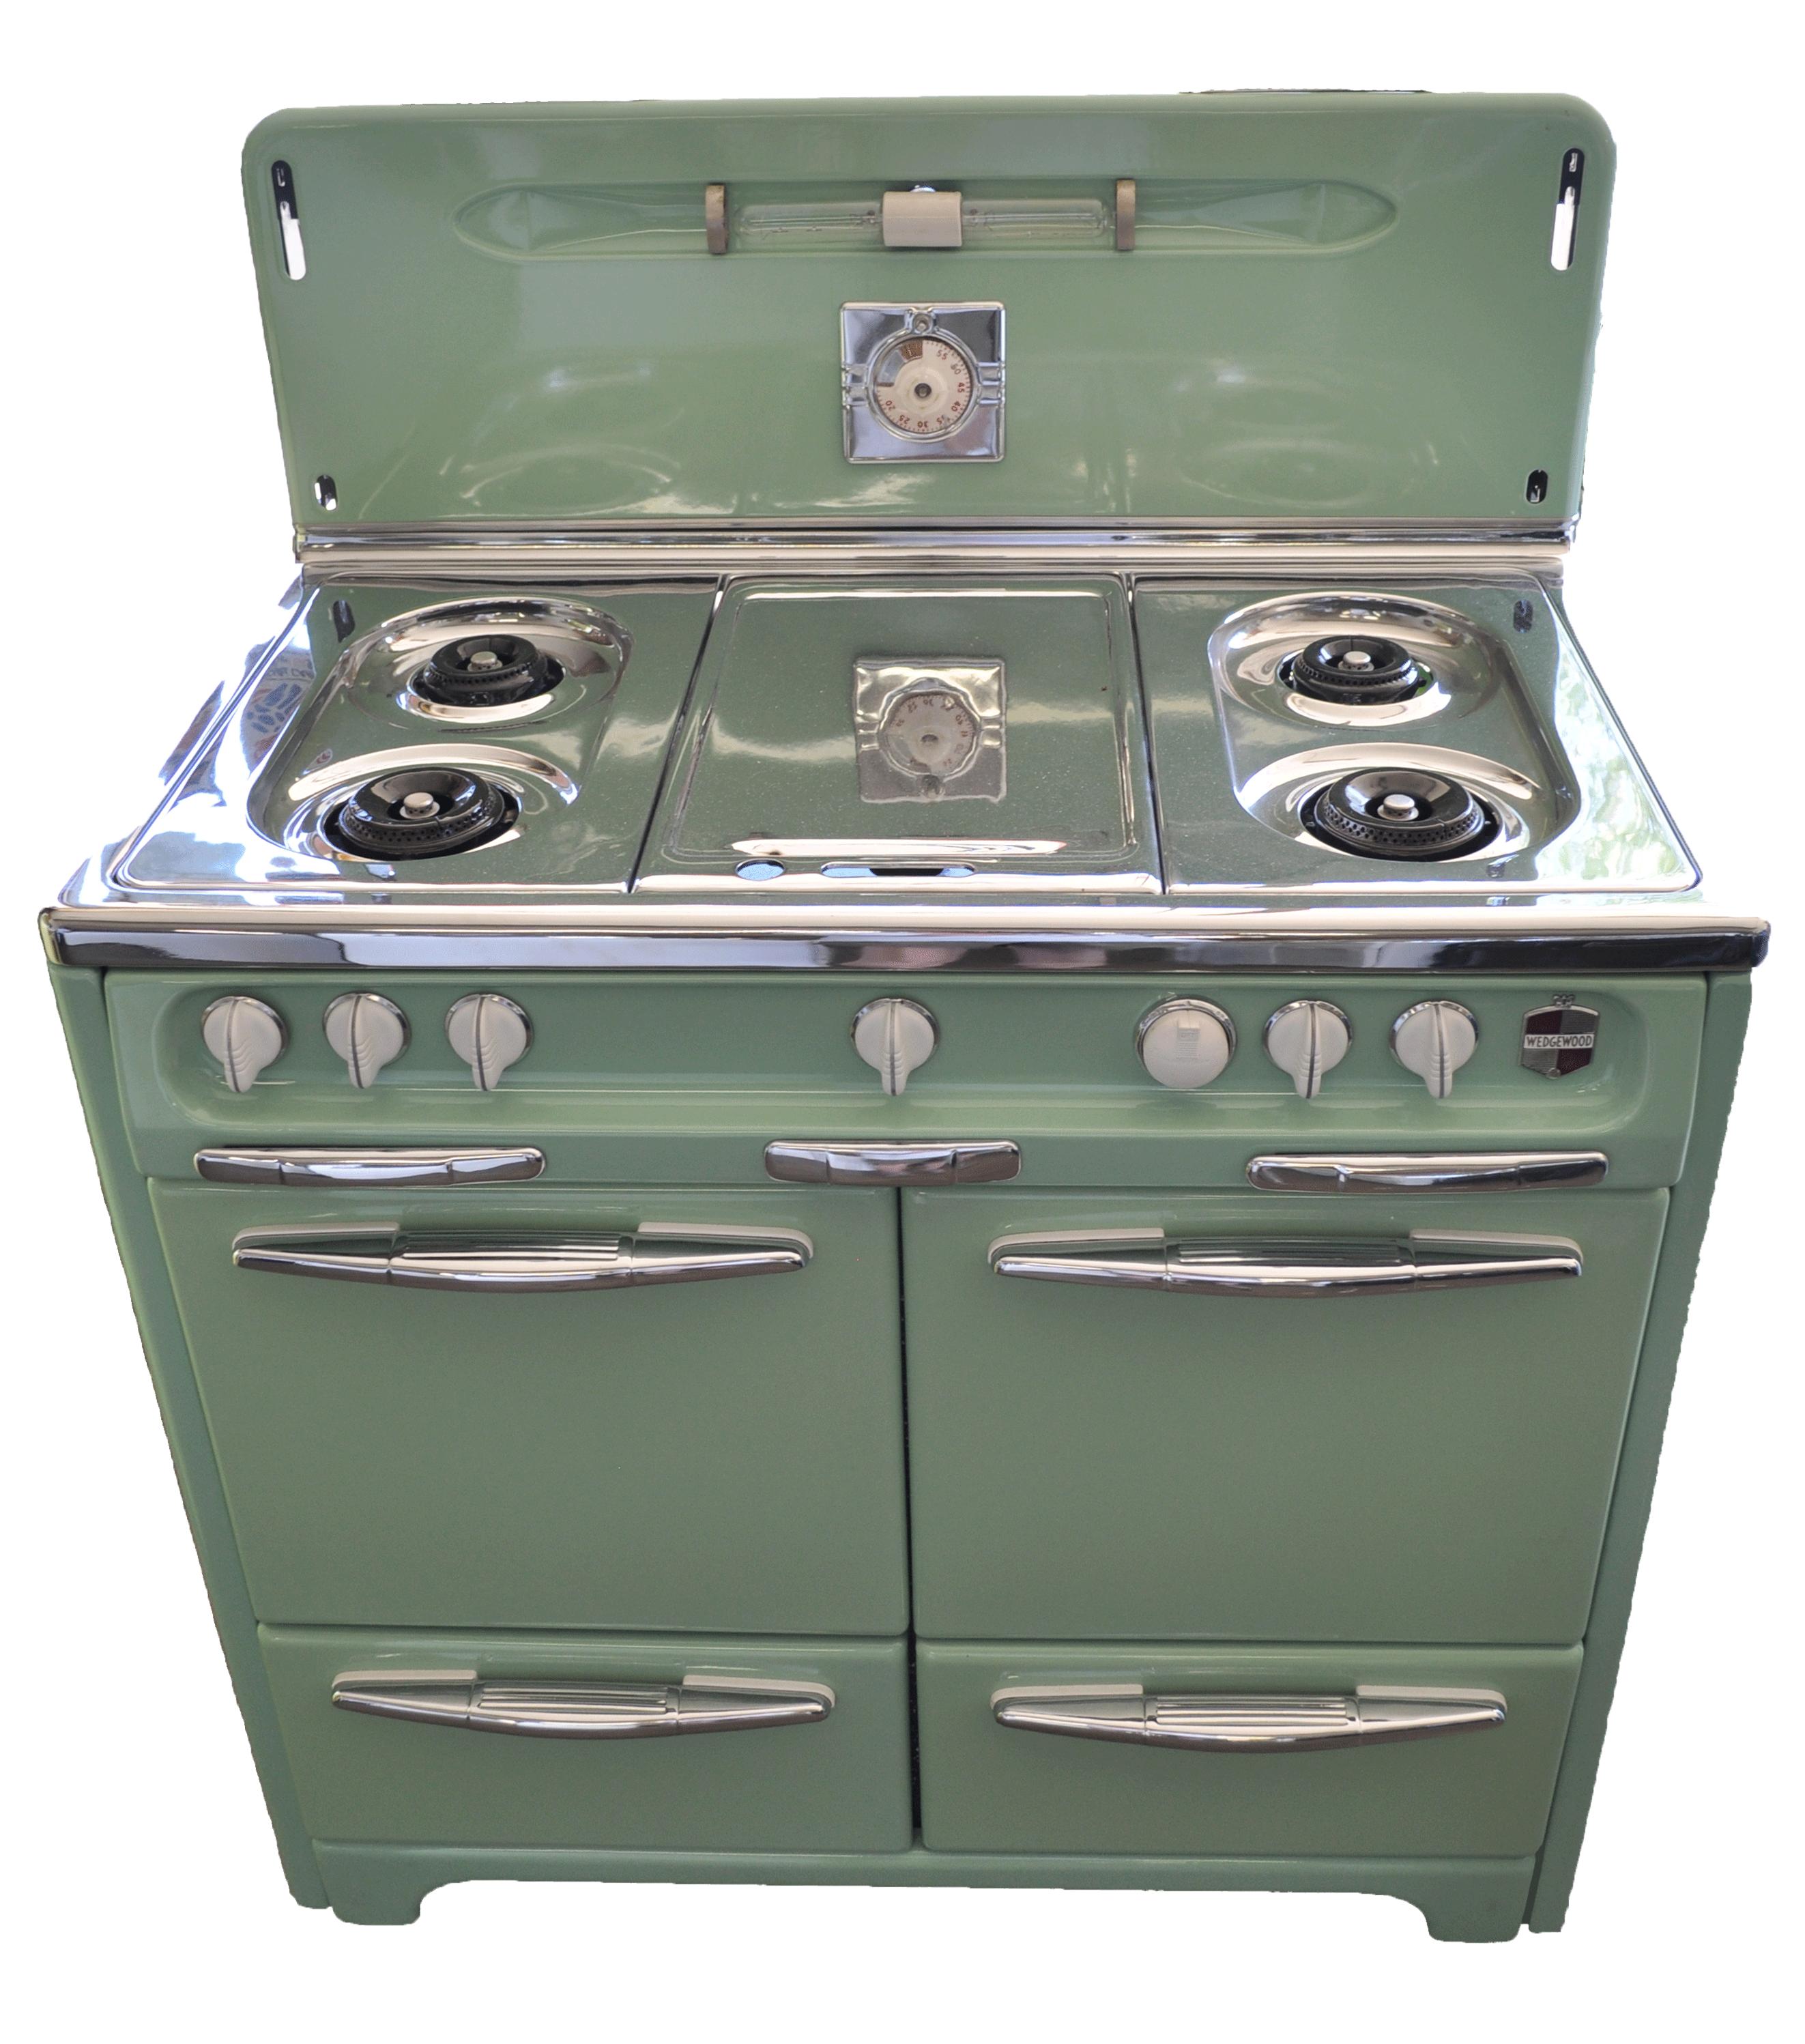 For Sale Savon Appliance Refinishing Stove Vintage Wedgewood Stoves Refurbished Vintage Stoves Antique Gas Vintage Stoves Antique Stove Vintage Appliances